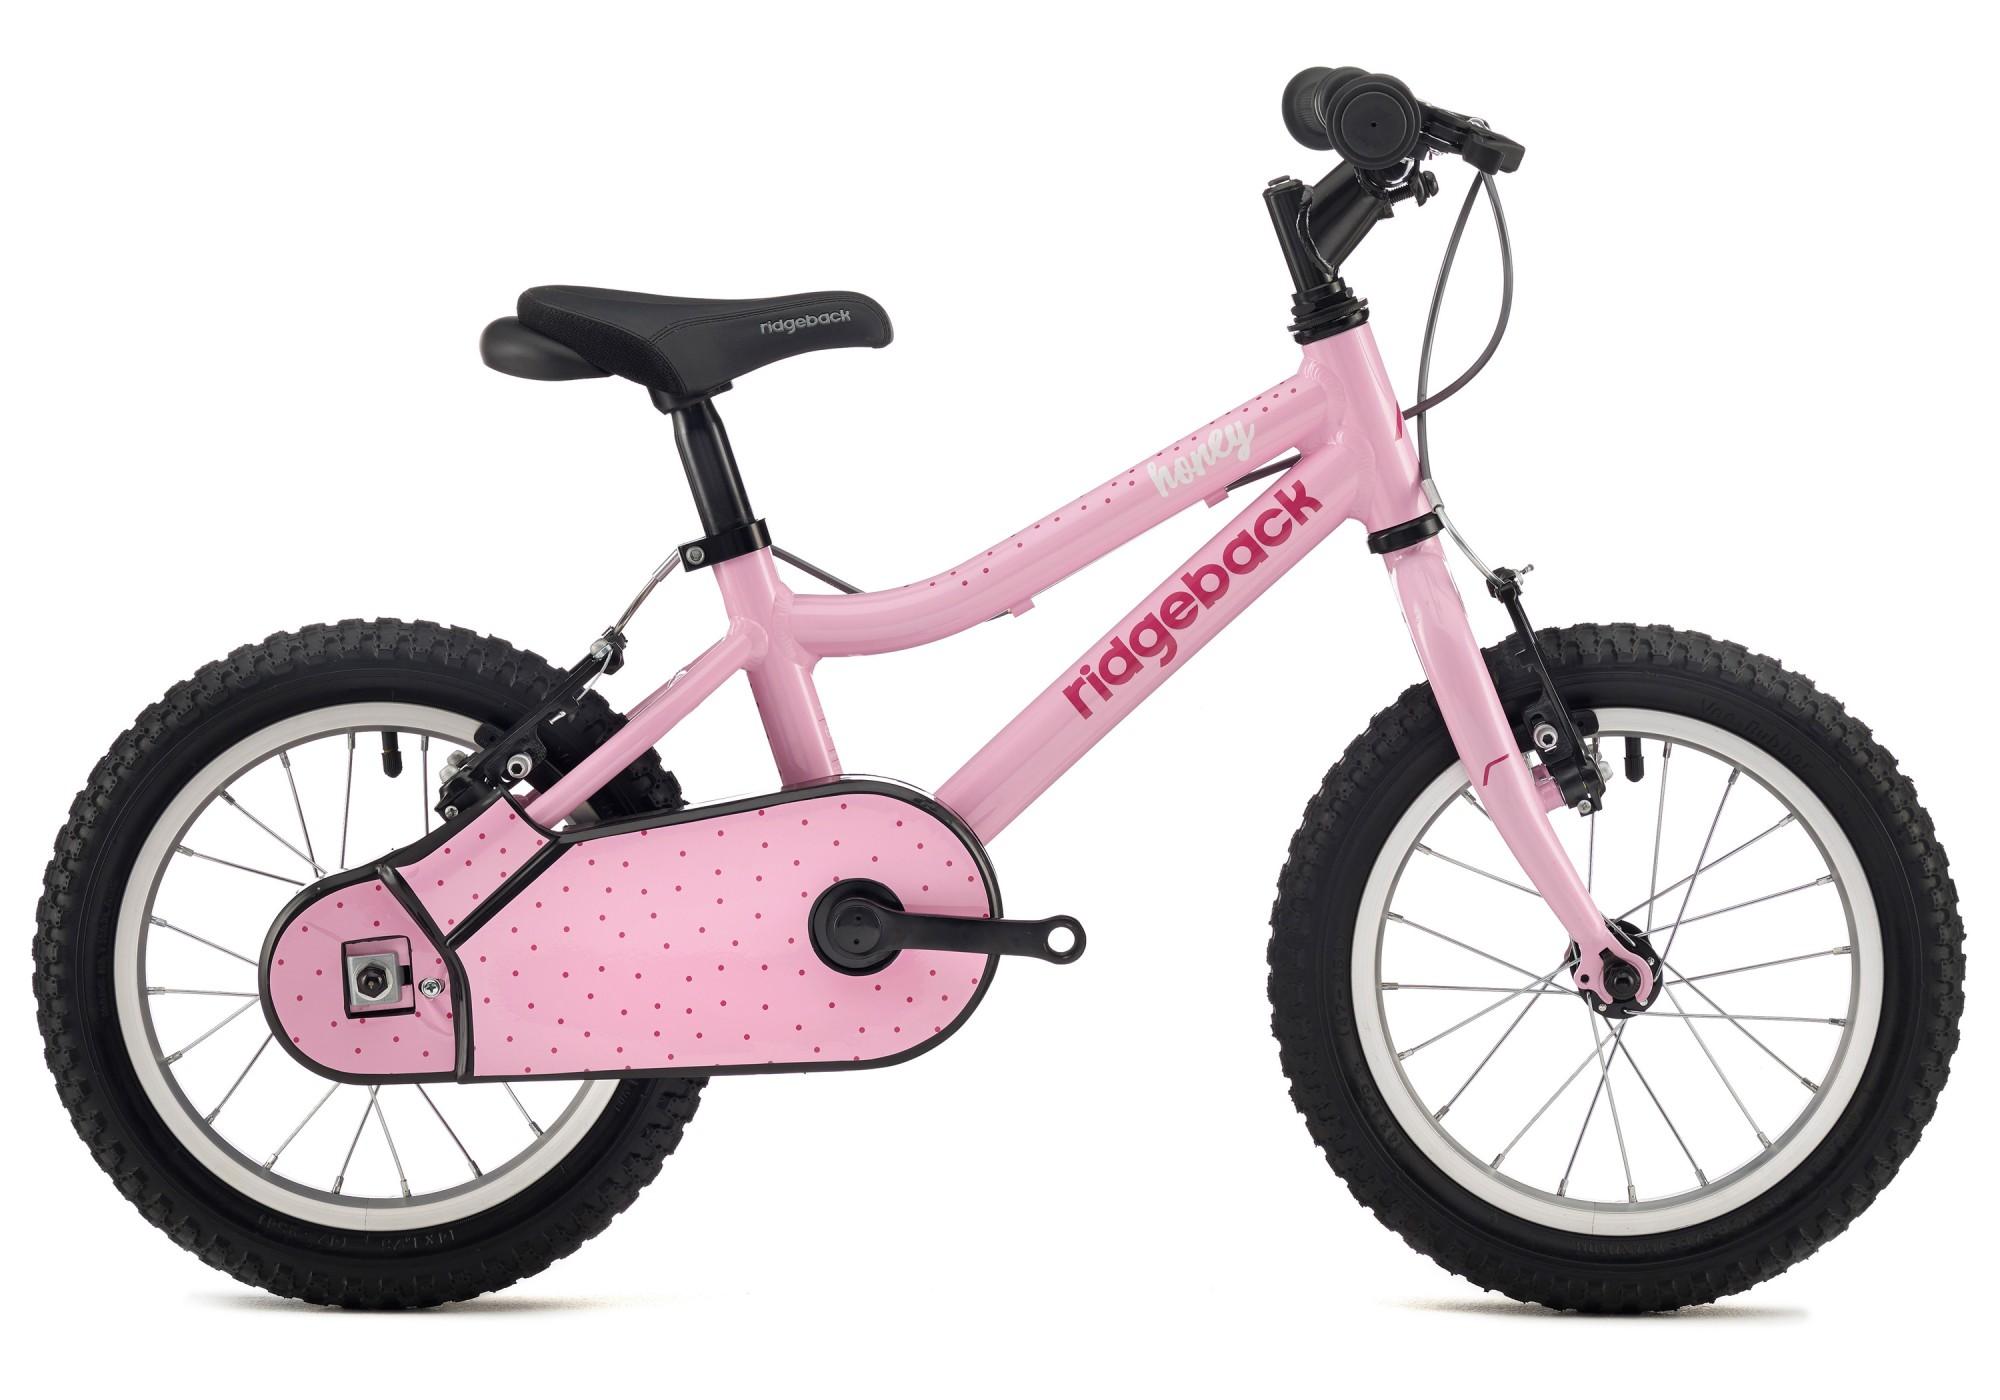 Ridgeback Honey 14 Girls 2018 Kids Bike Edinburgh Bicycle Co Op